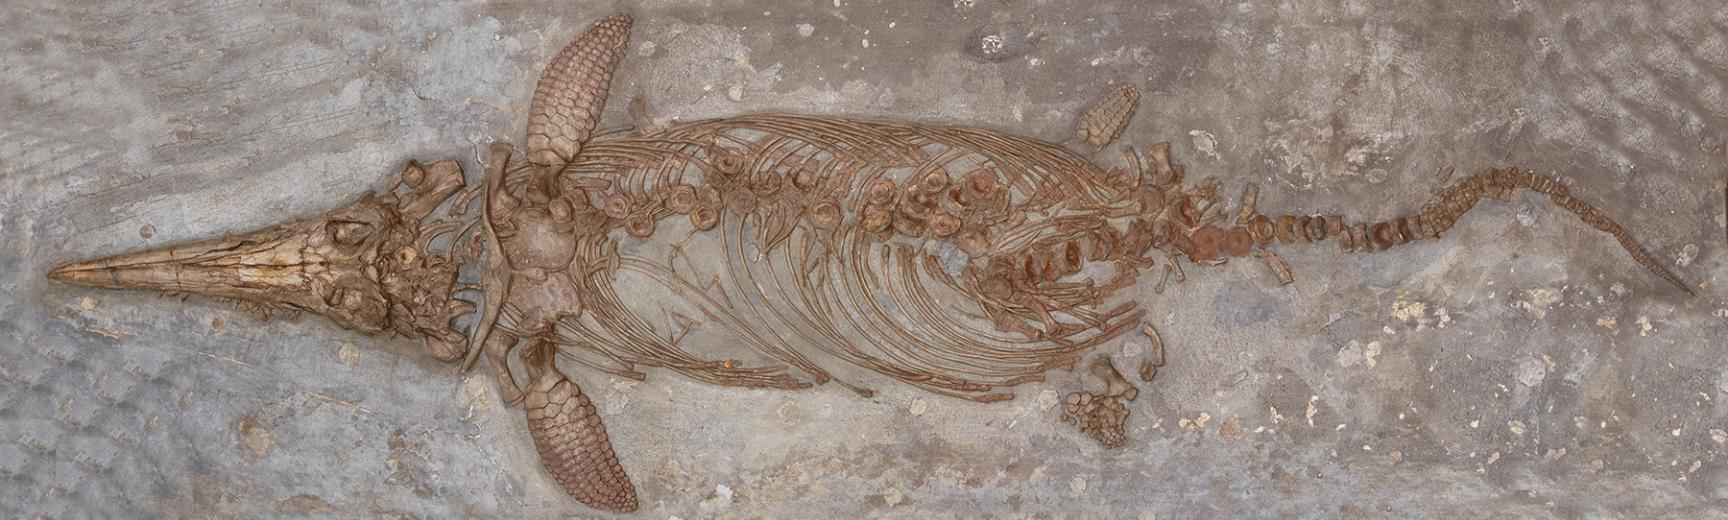 Marine reptile at OUMNH